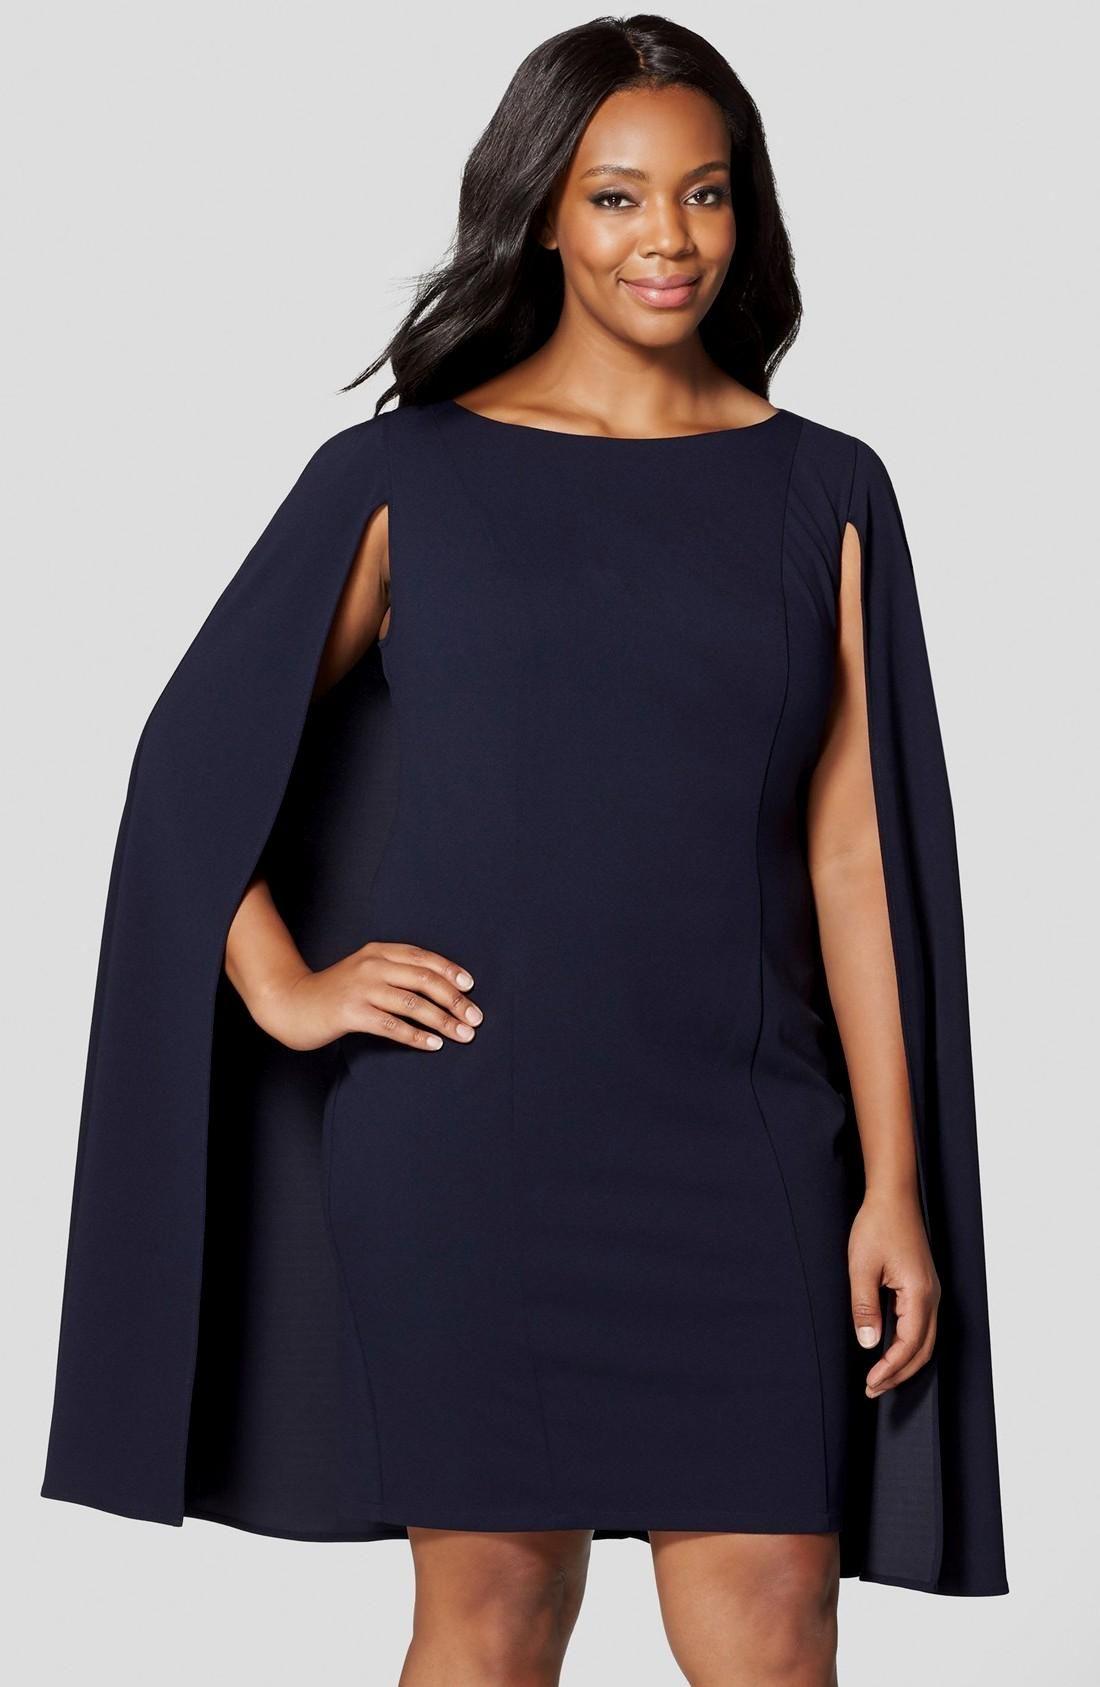 nordstrom black dresses plus size